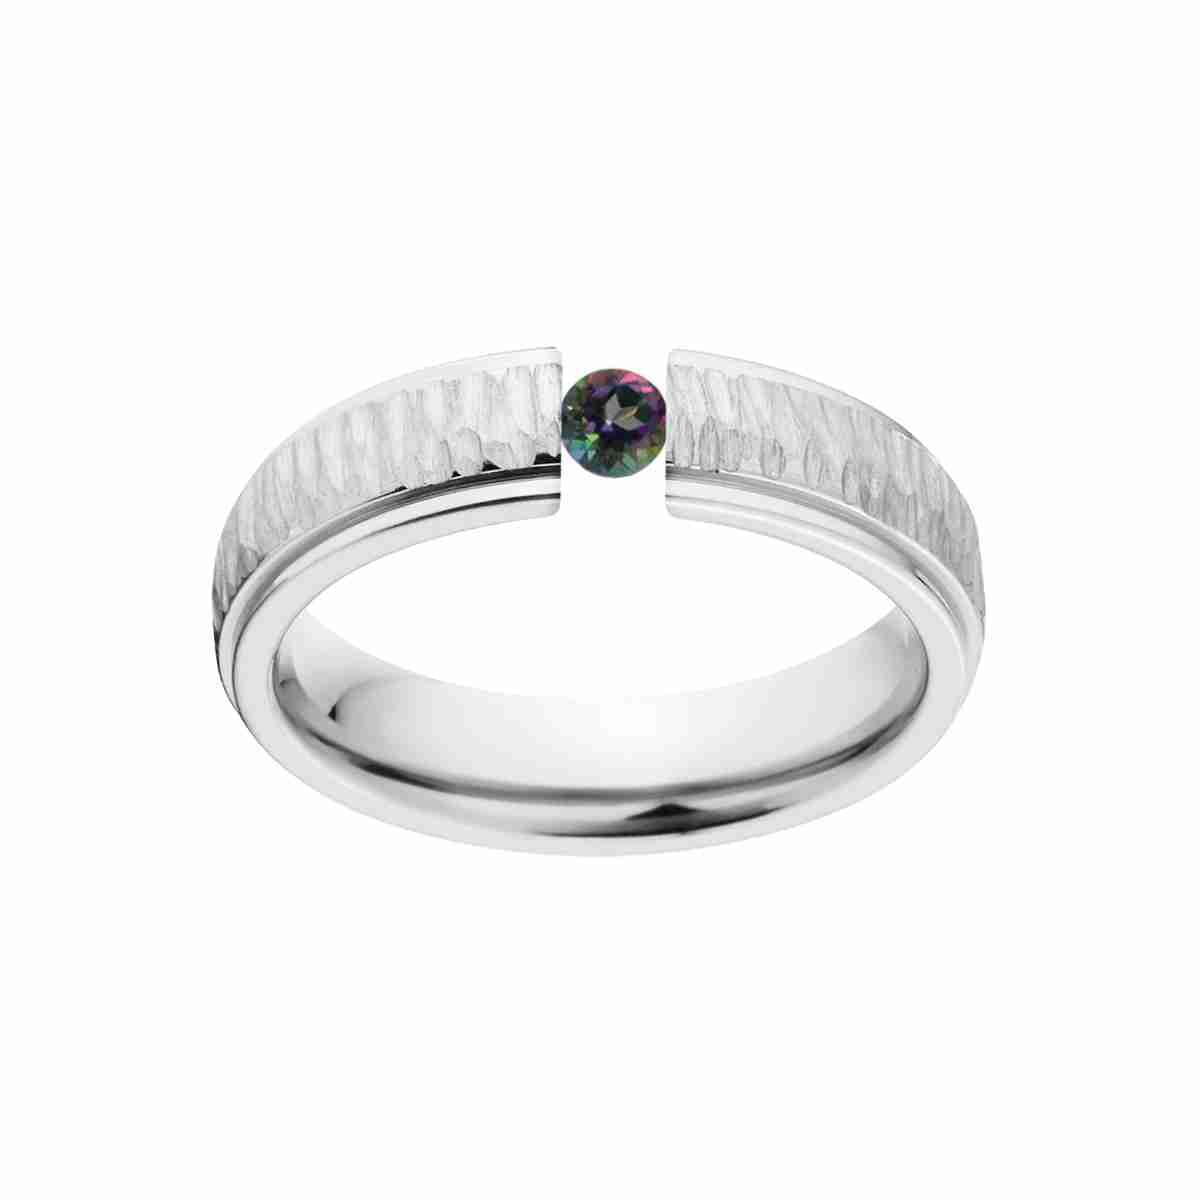 Mystic Topaz 5mm Stainless Steel Custom Tension Set Ring by Luxurien